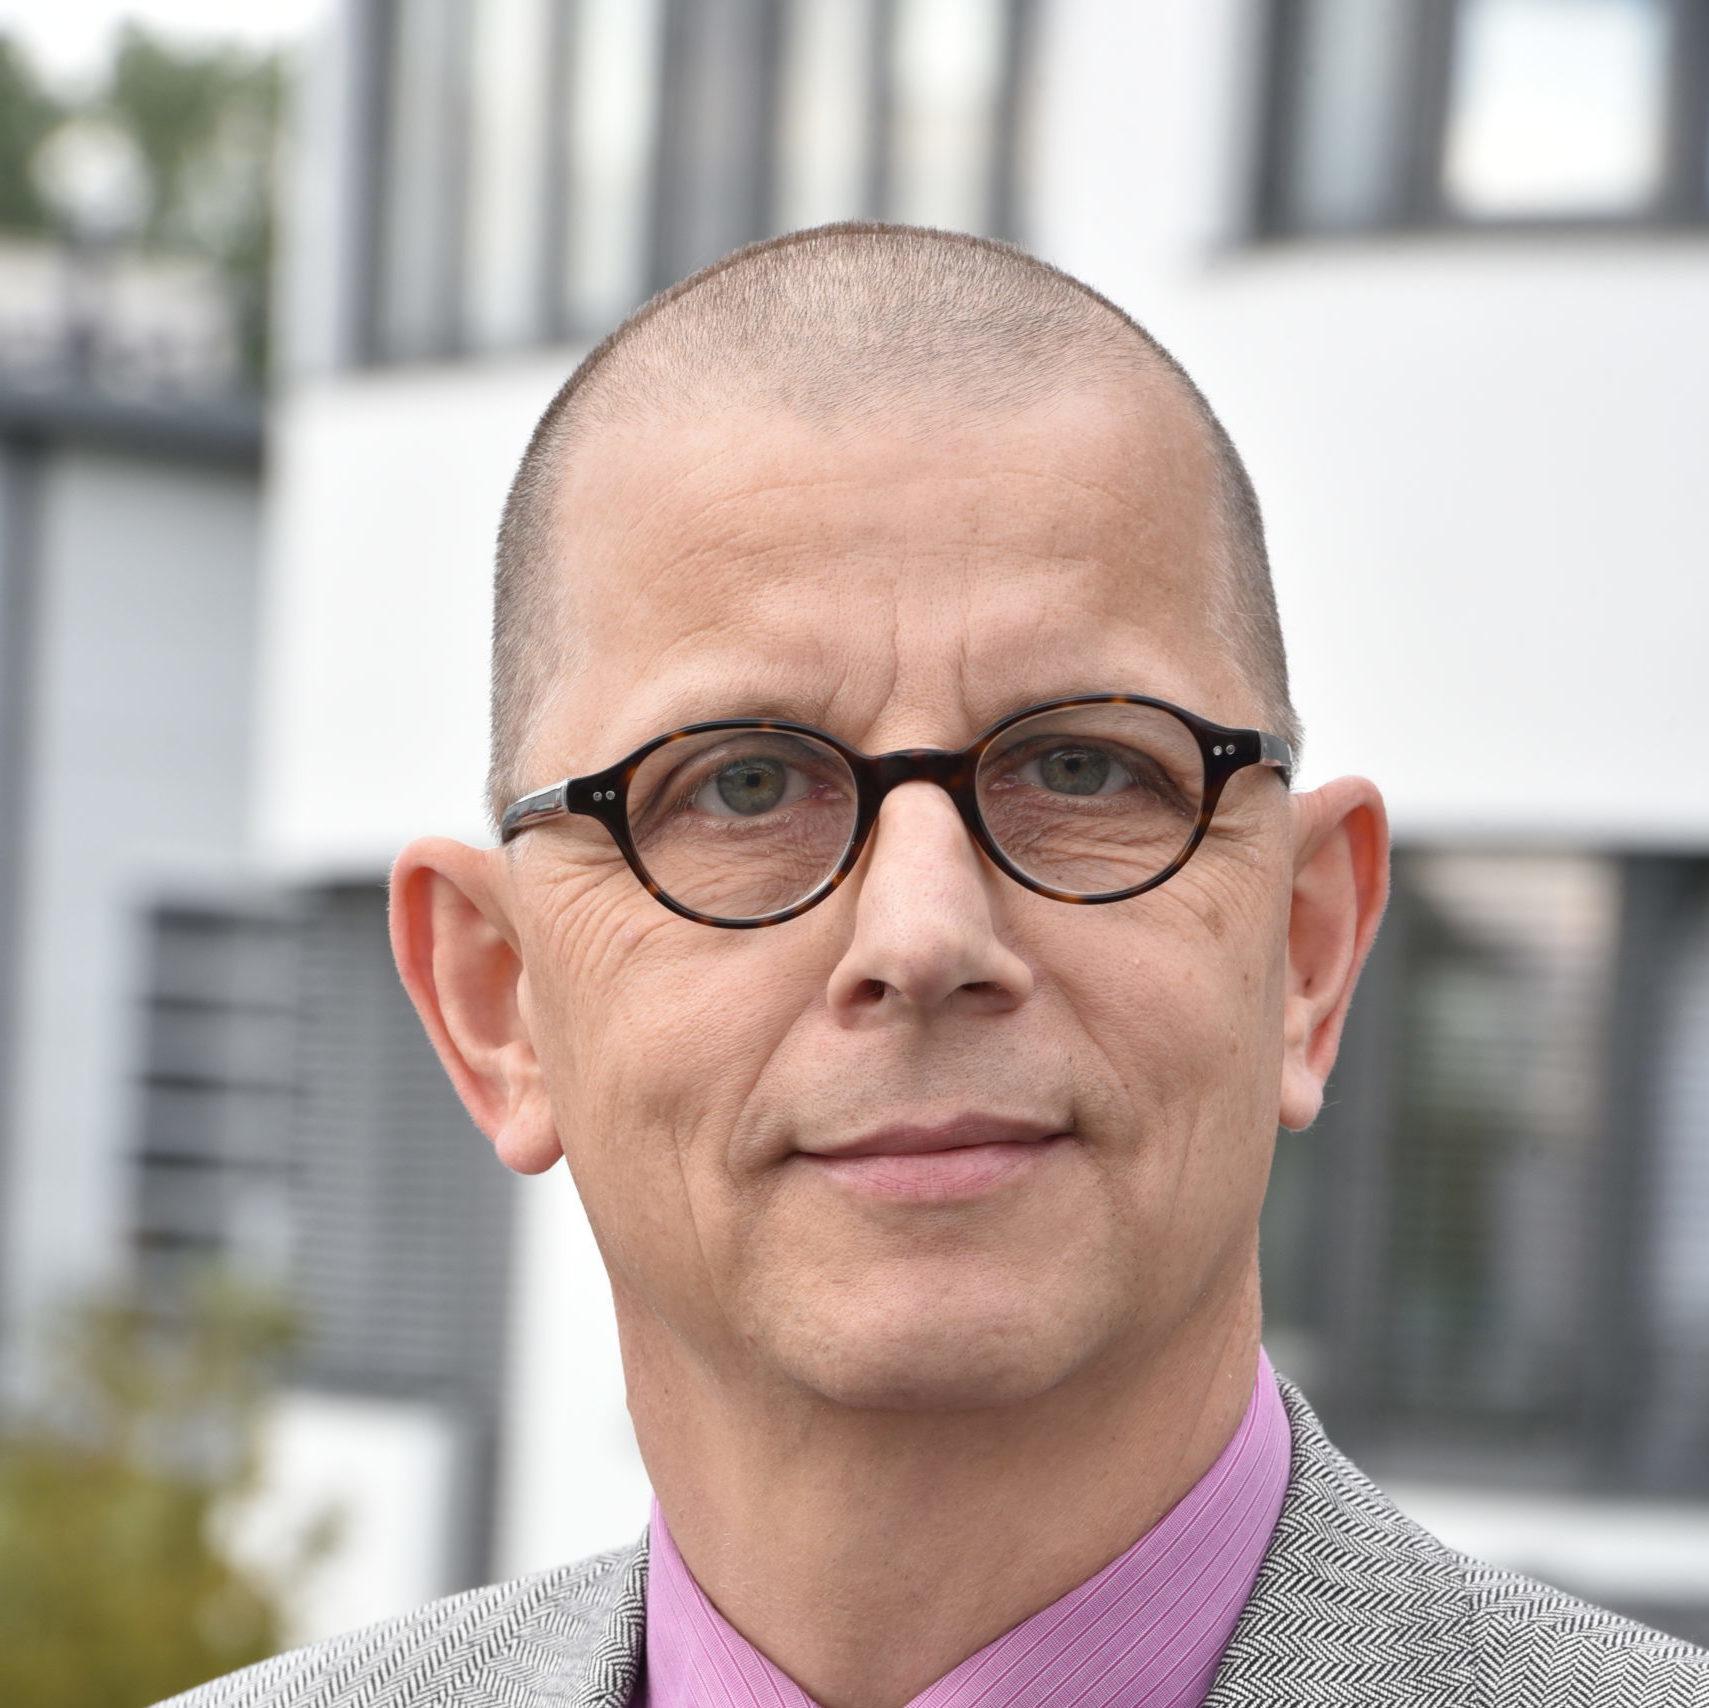 Martin Cremerius, Christoffel-Blindenmission, Referenz synalis